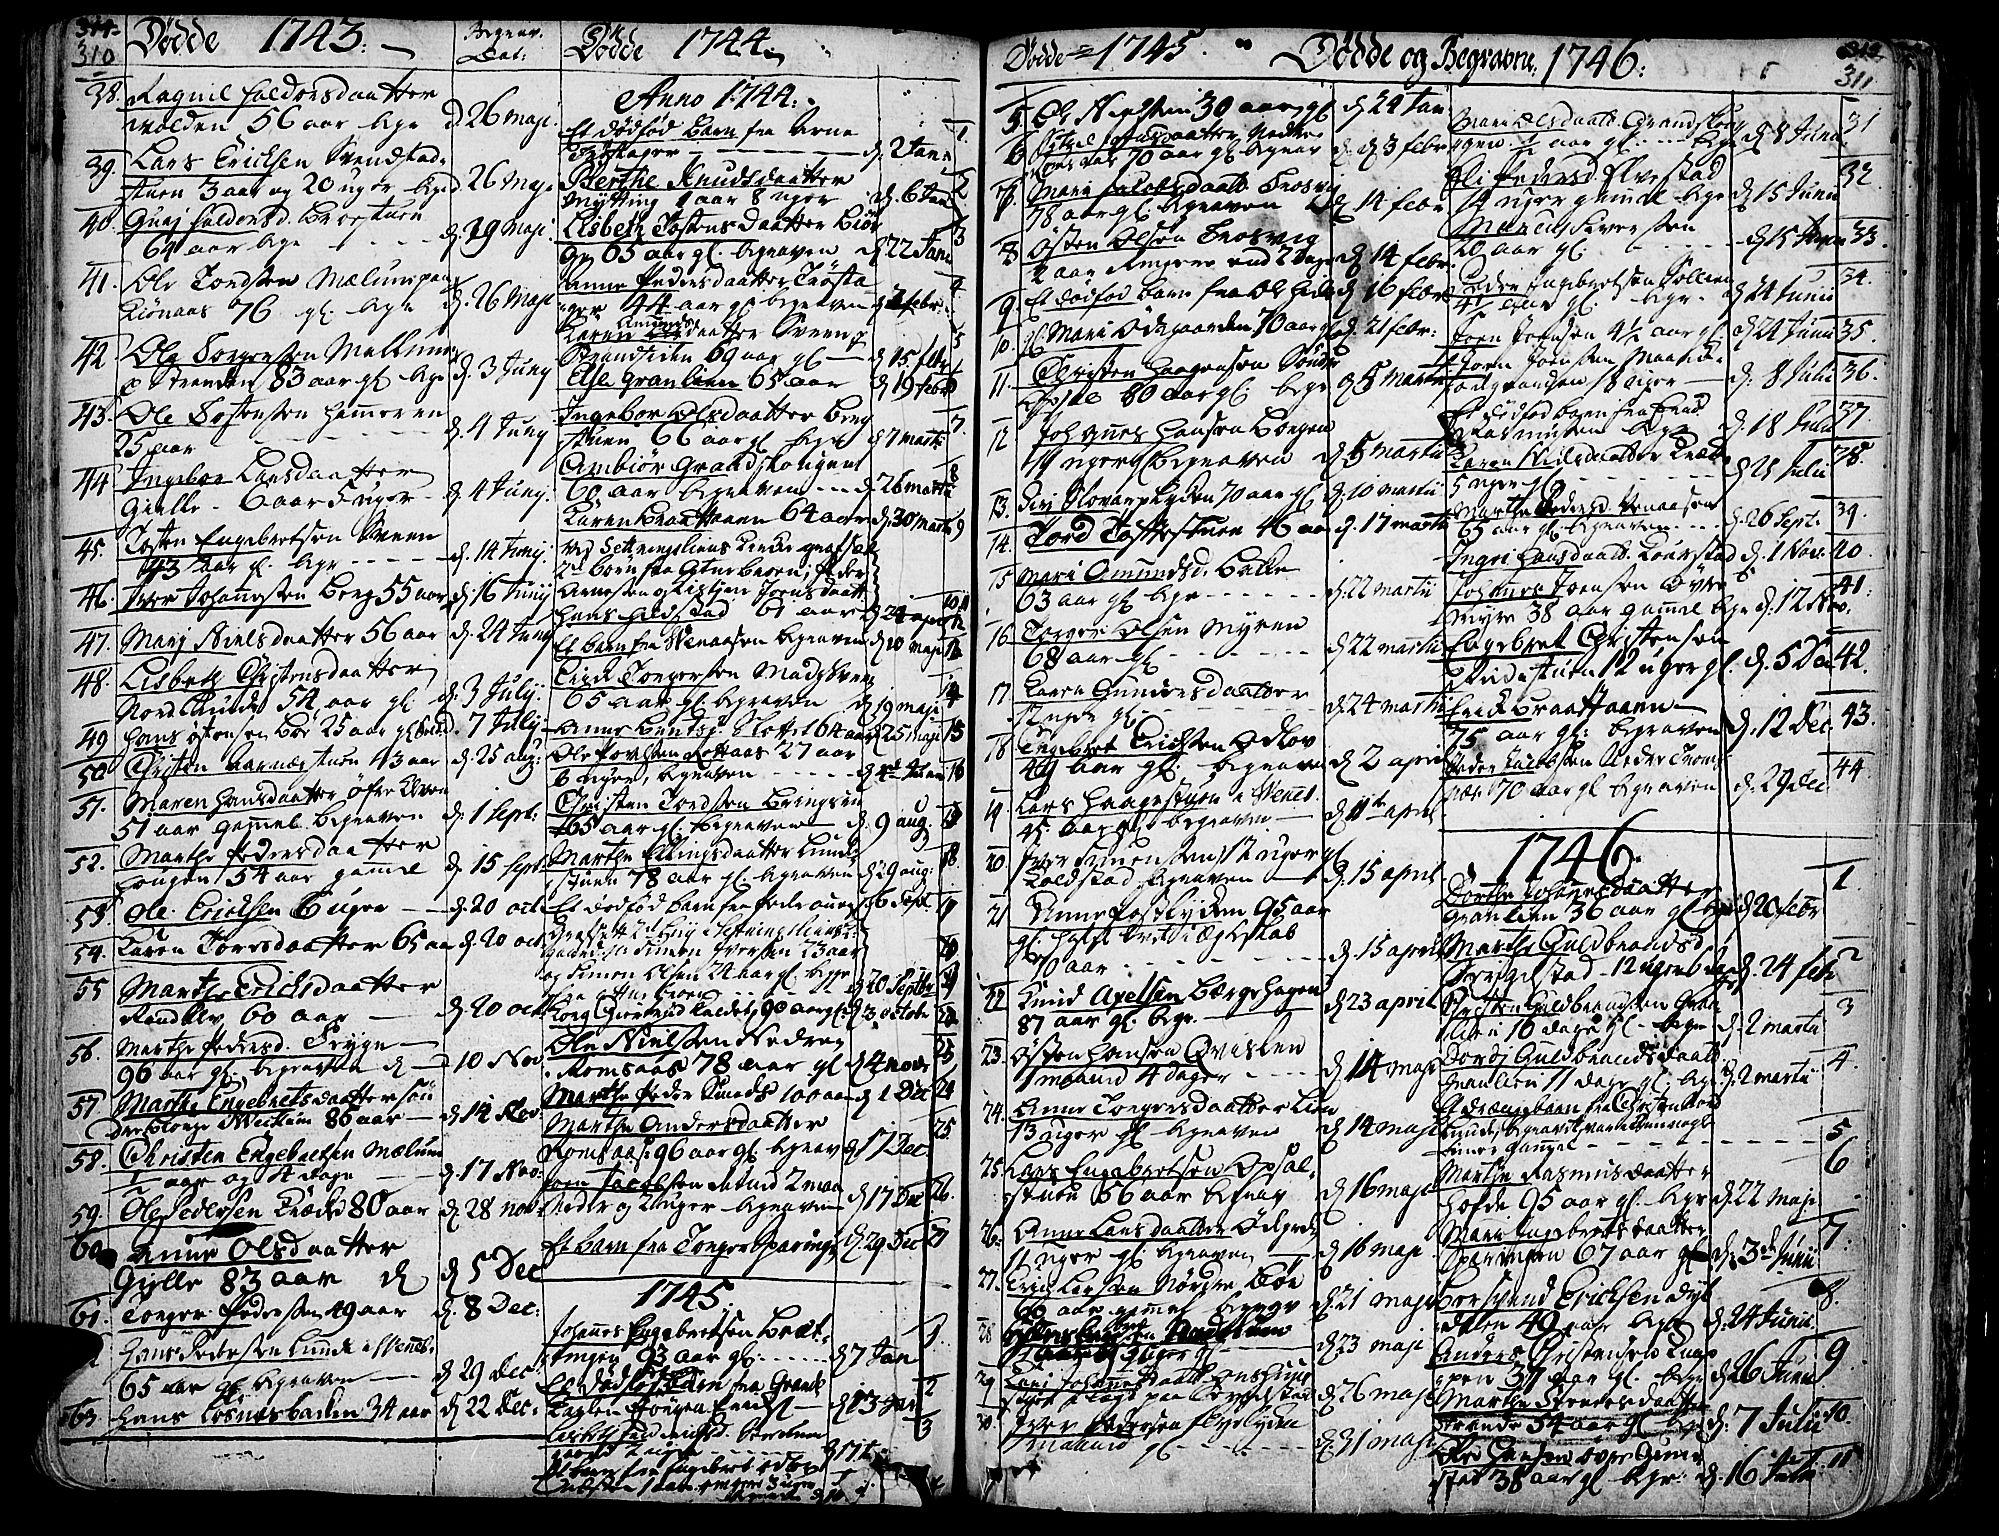 SAH, Ringebu prestekontor, Ministerialbok nr. 2, 1734-1780, s. 310-311